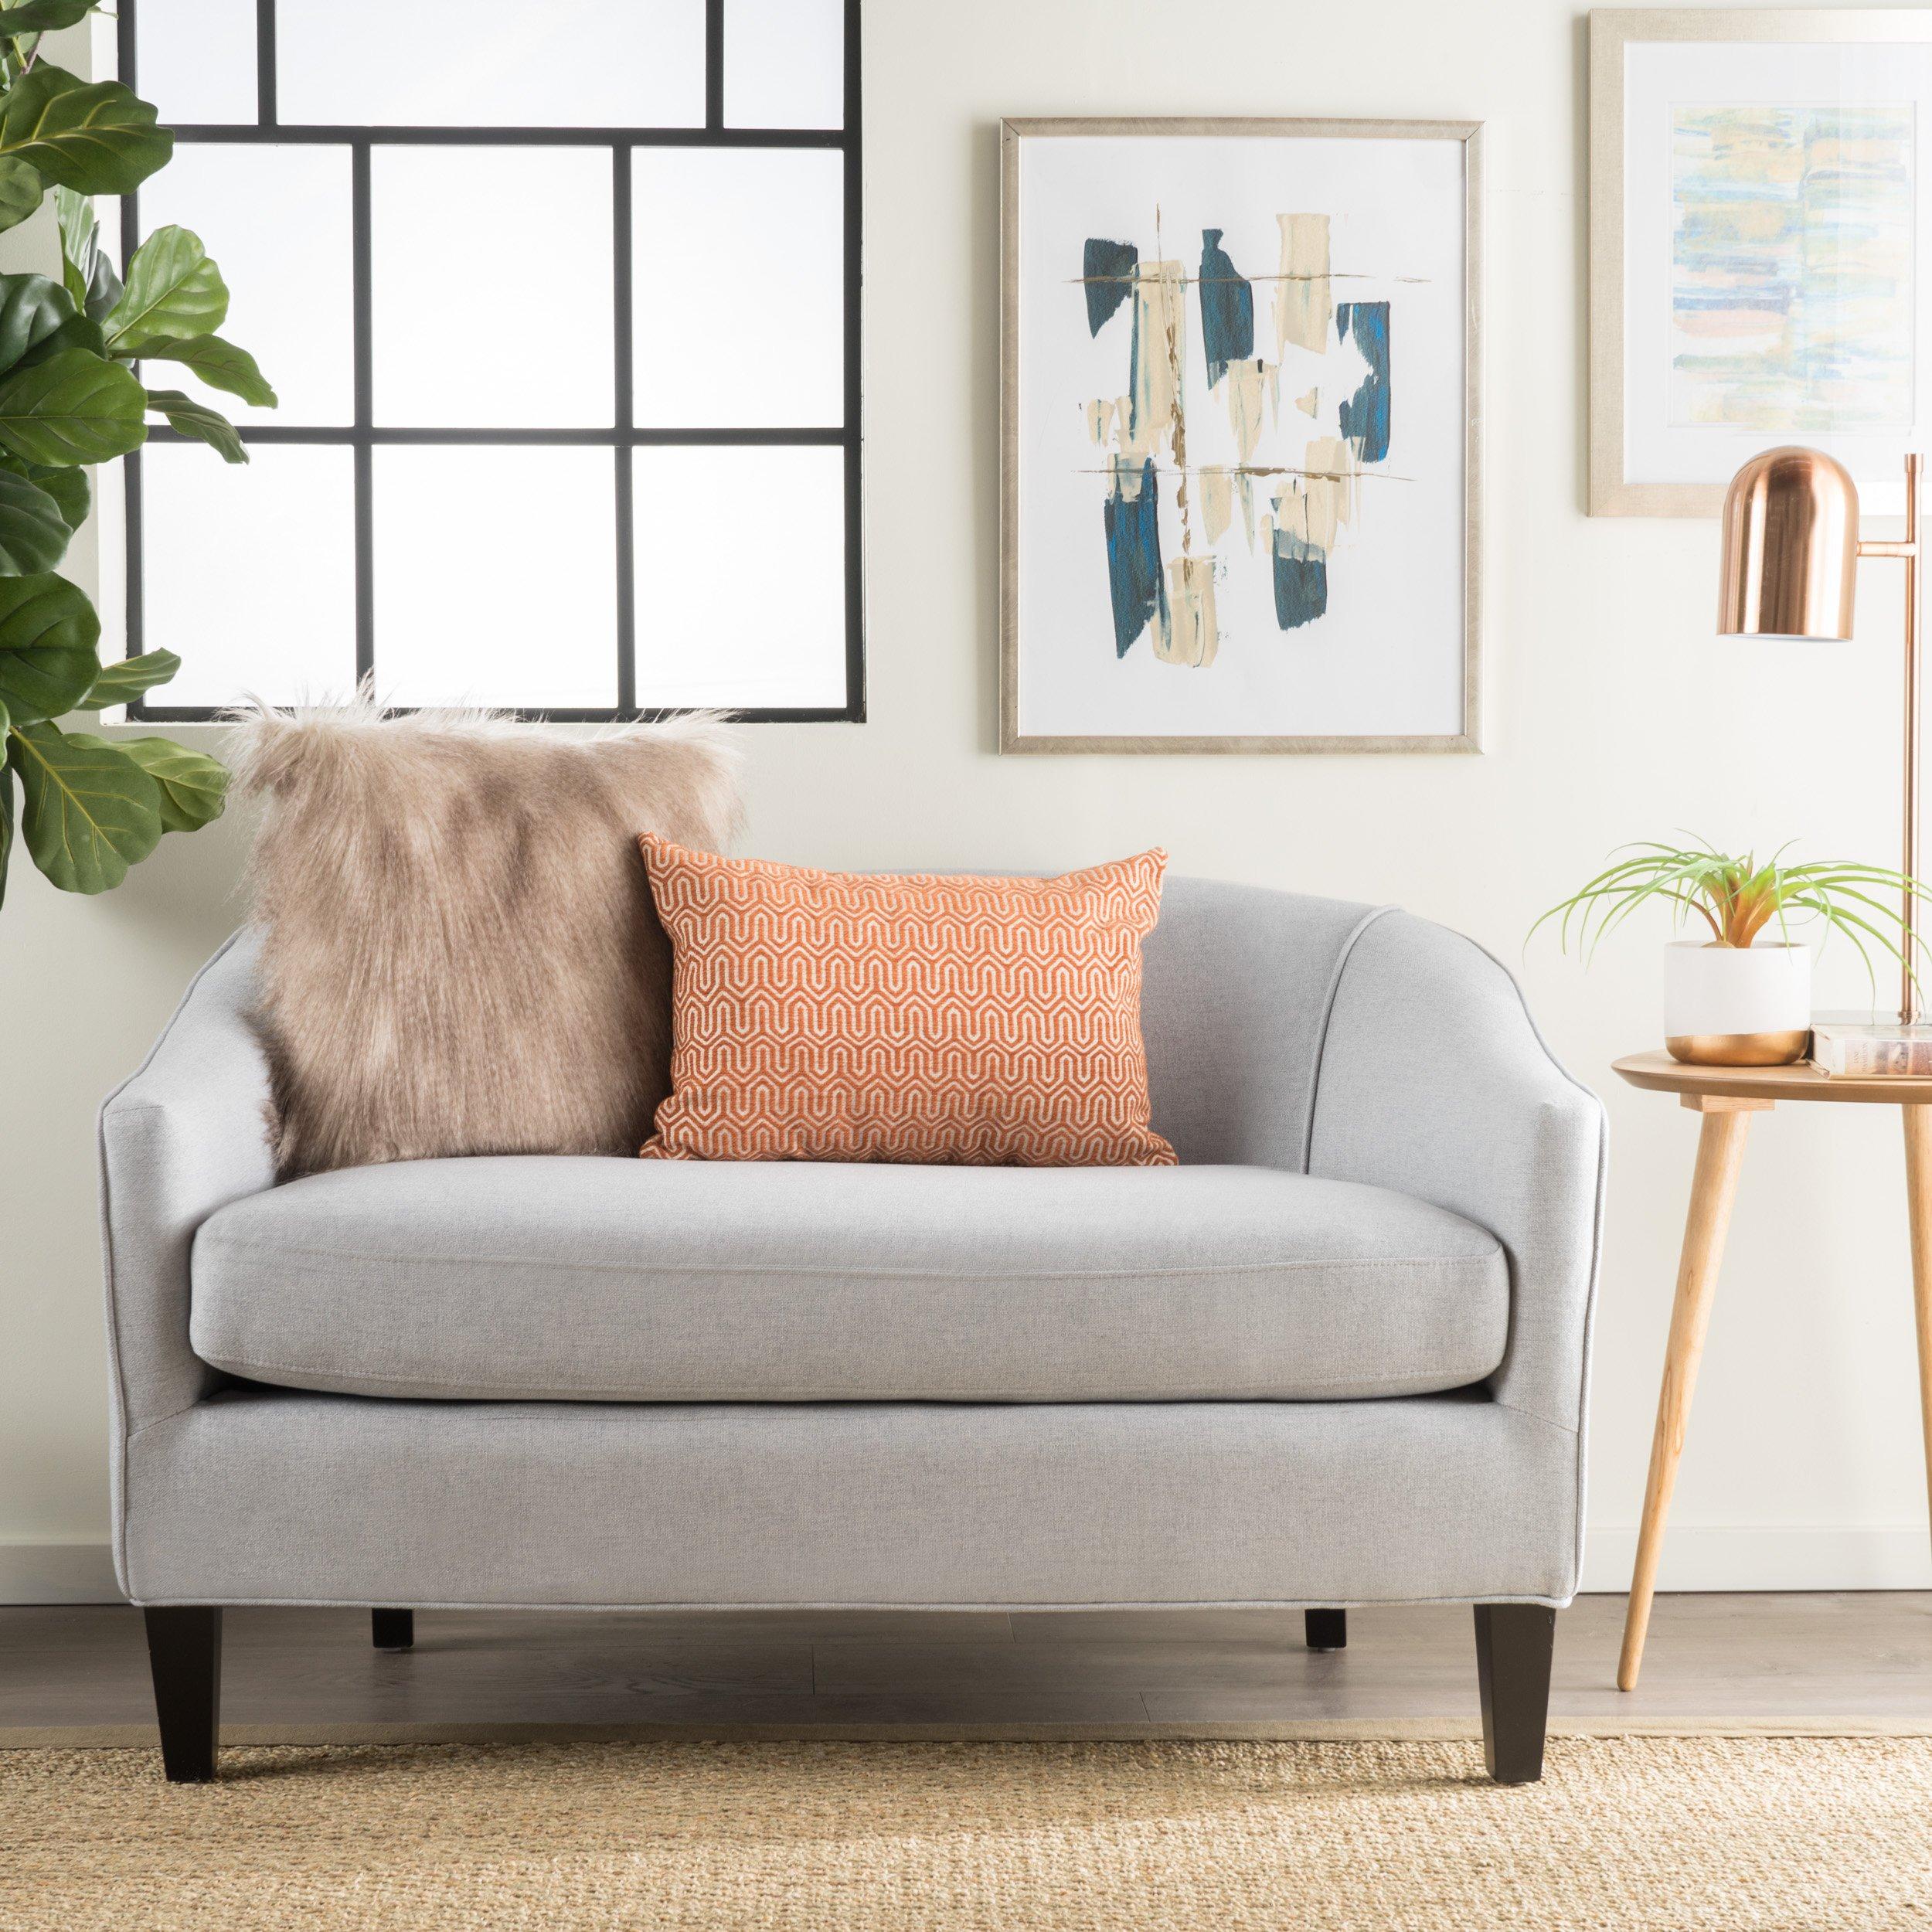 Isolde Modern Petite Loveseat (Fabric or Leather) (Light Grey Fabric)